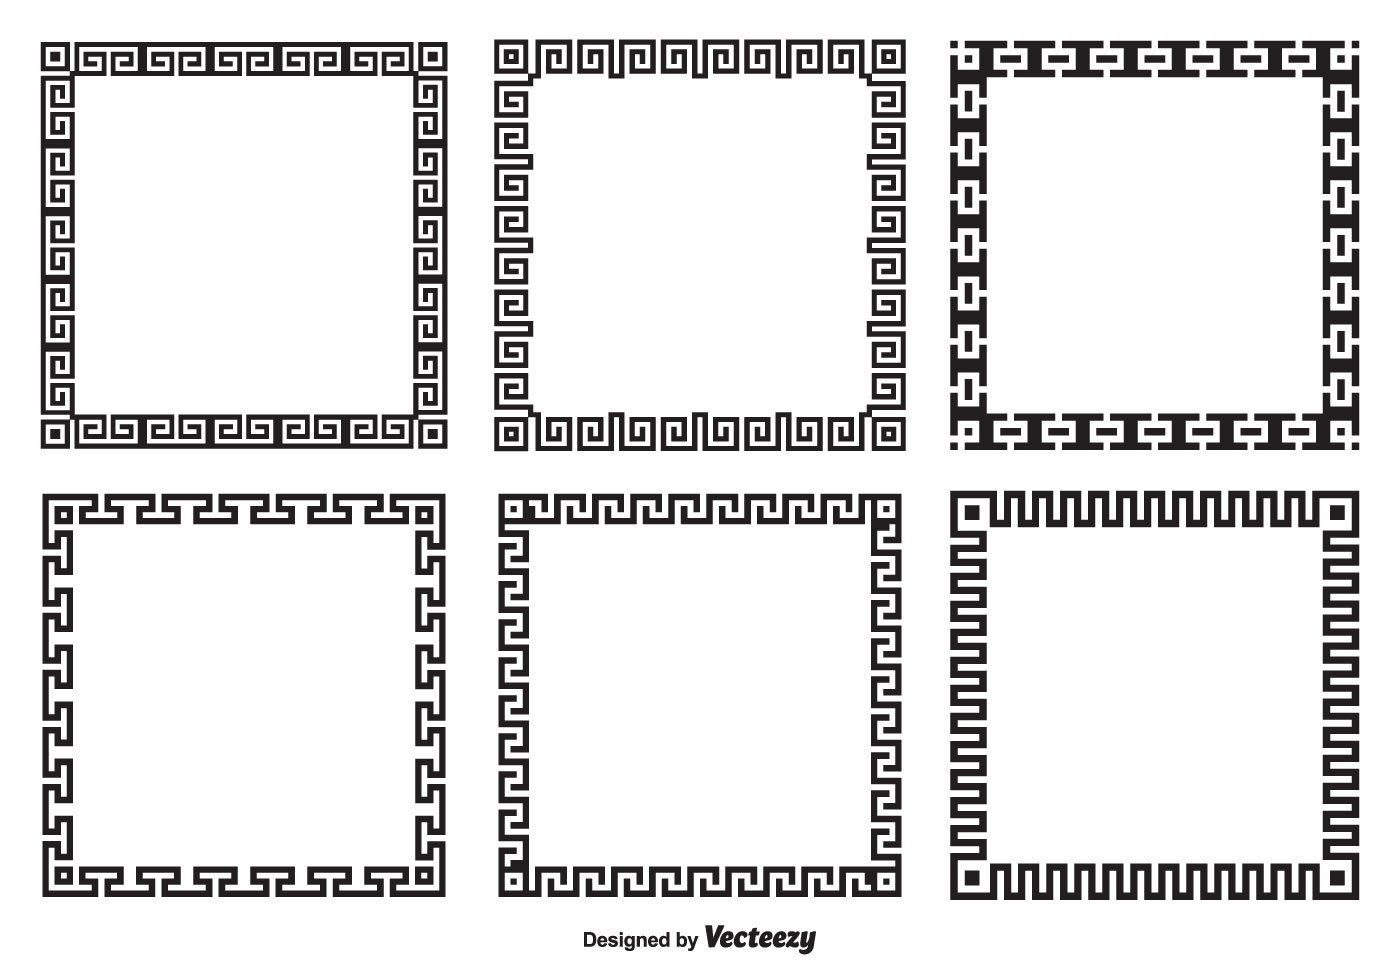 Greek Key Border Style Frames - Download Free Vector Art ...